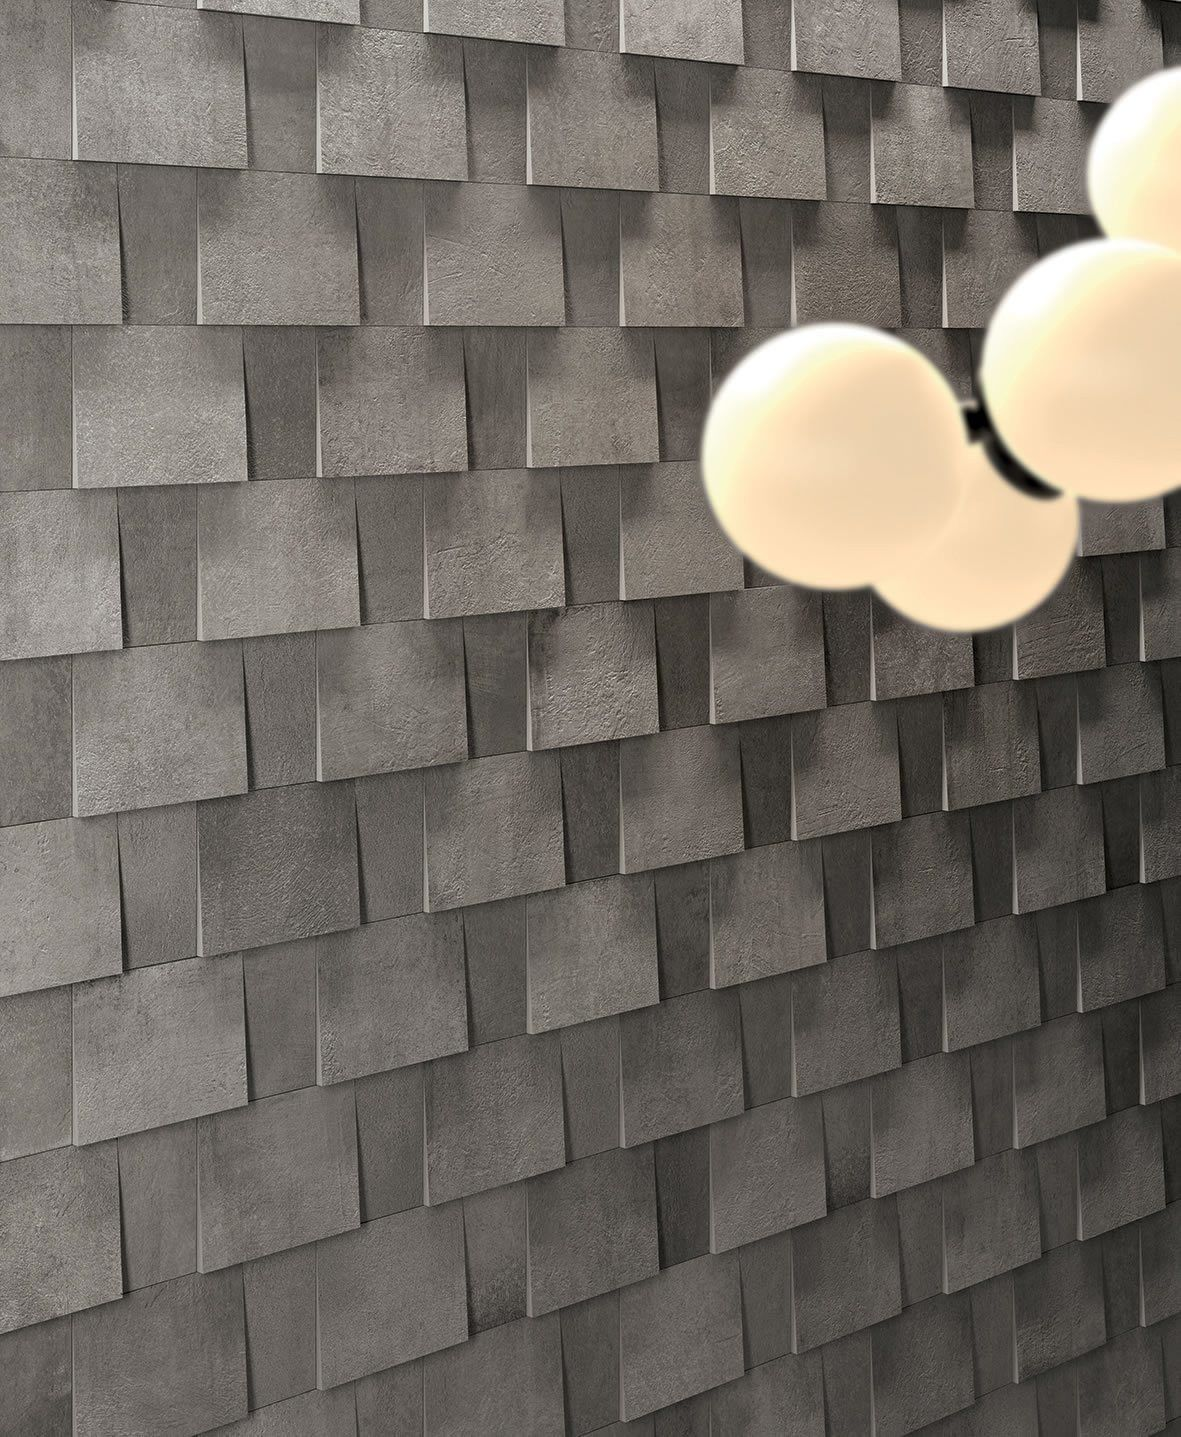 Kronos Prima Materia Sandalo Muro 3d 29x29 Cm 8193